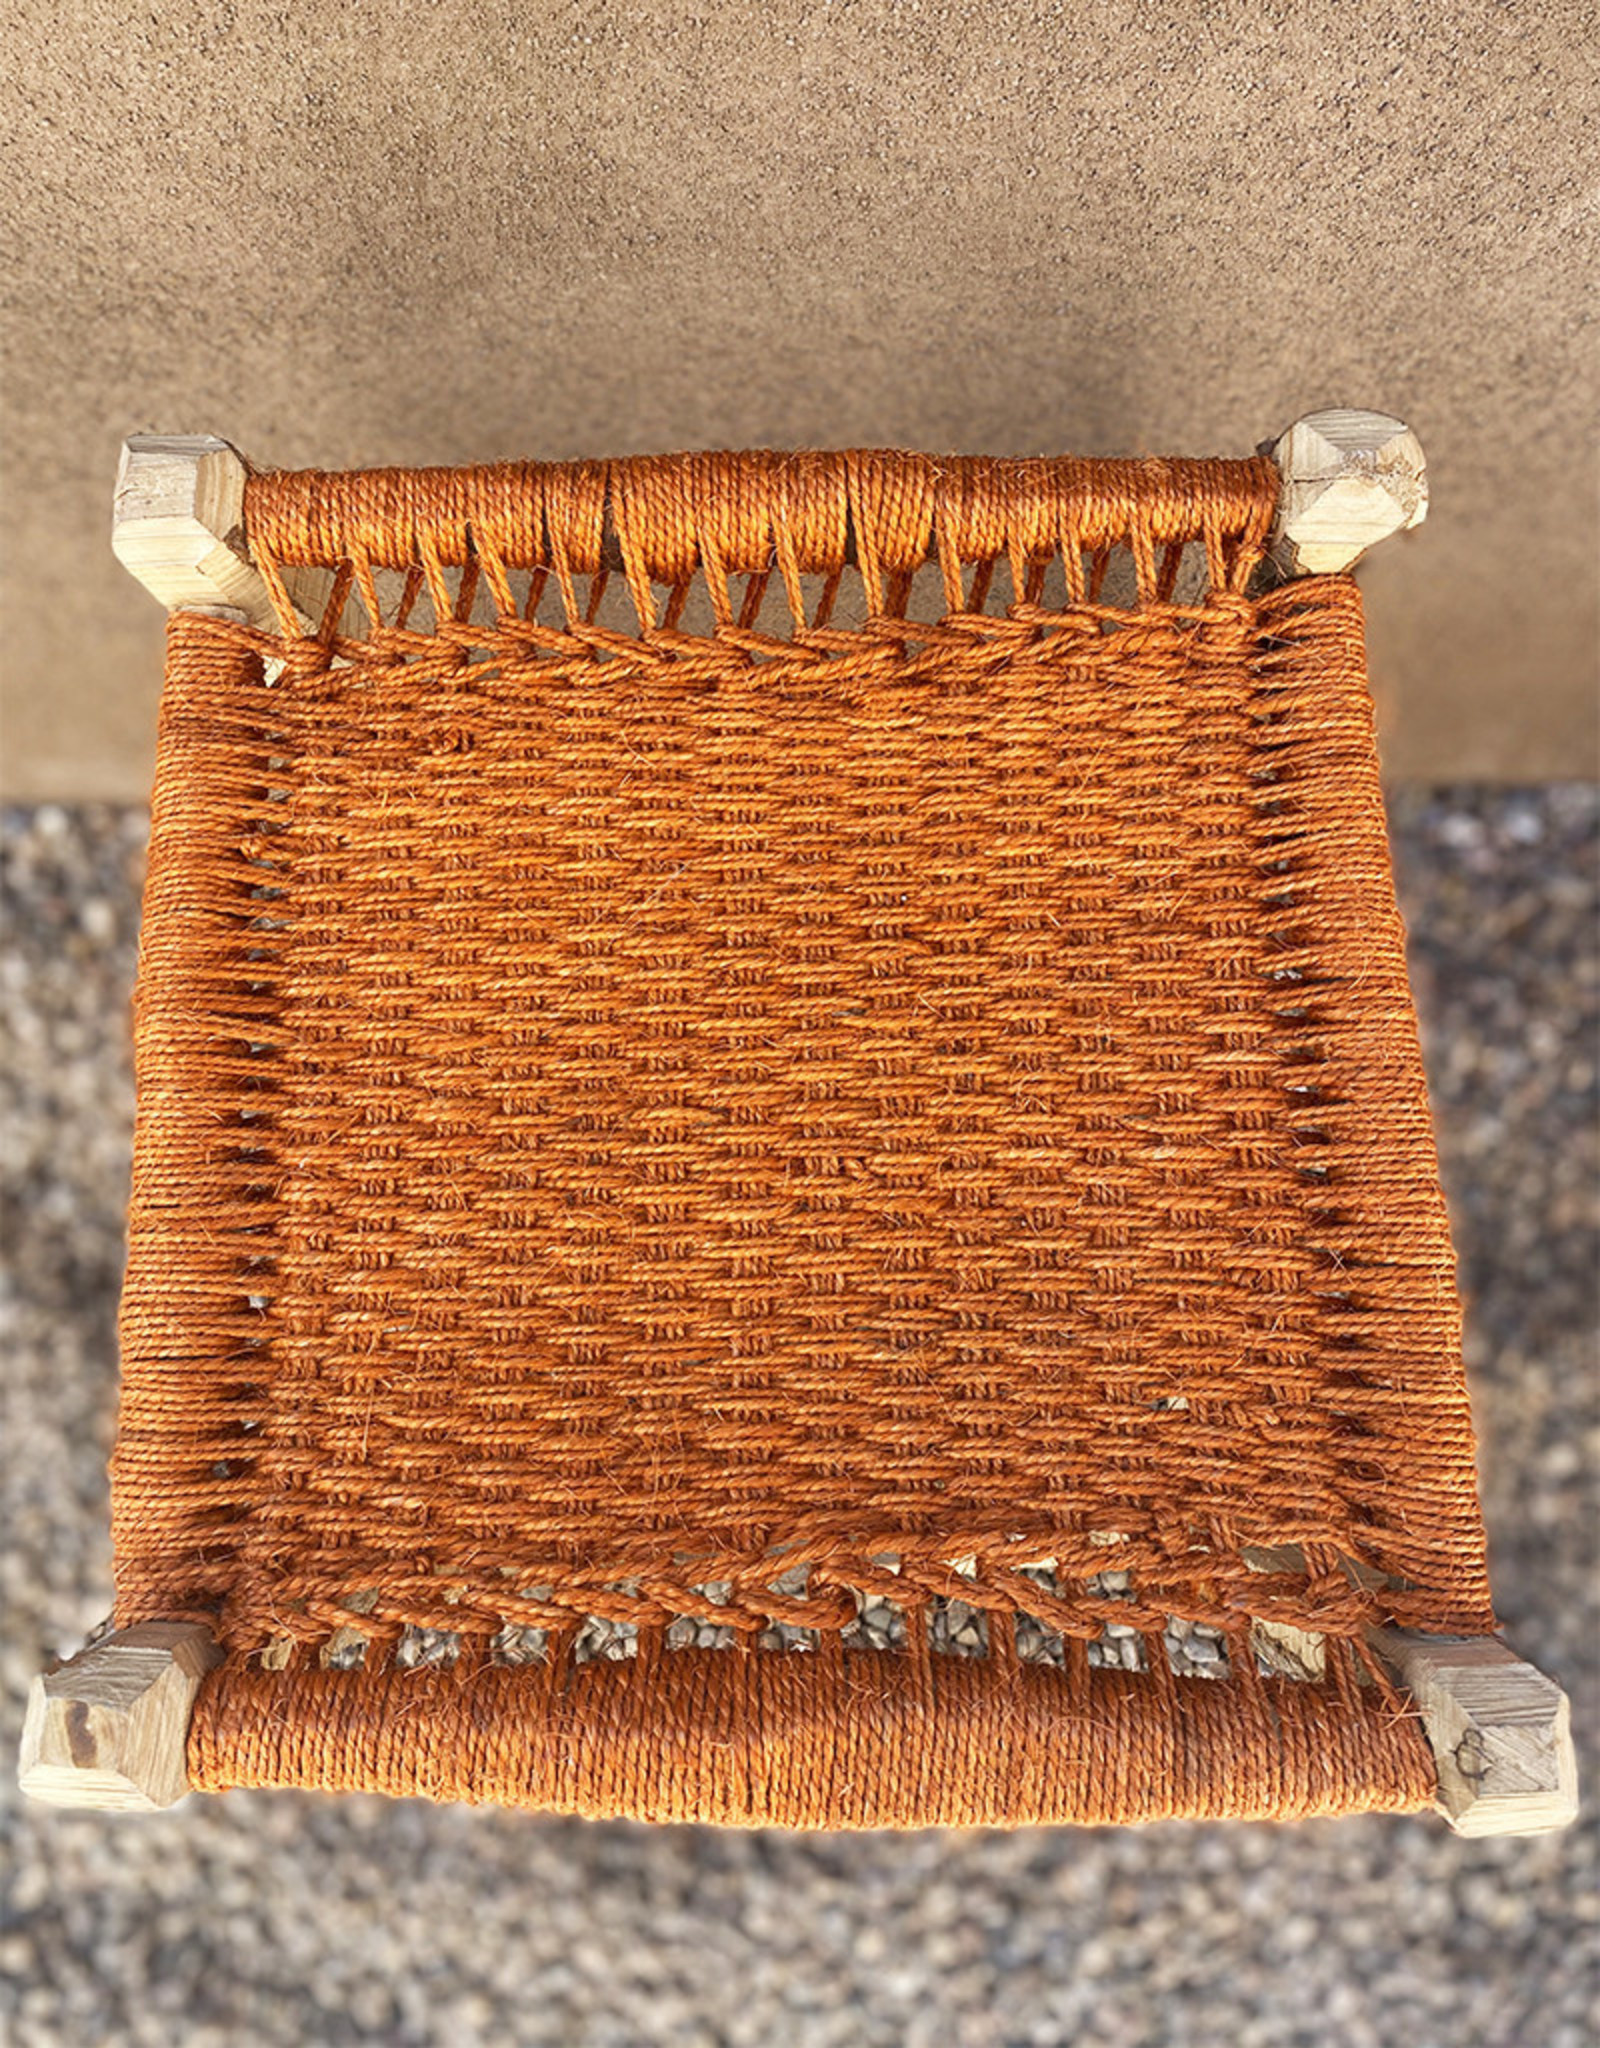 Artizana Mechy Handwoven Recycled Olive Wood Stools Orange